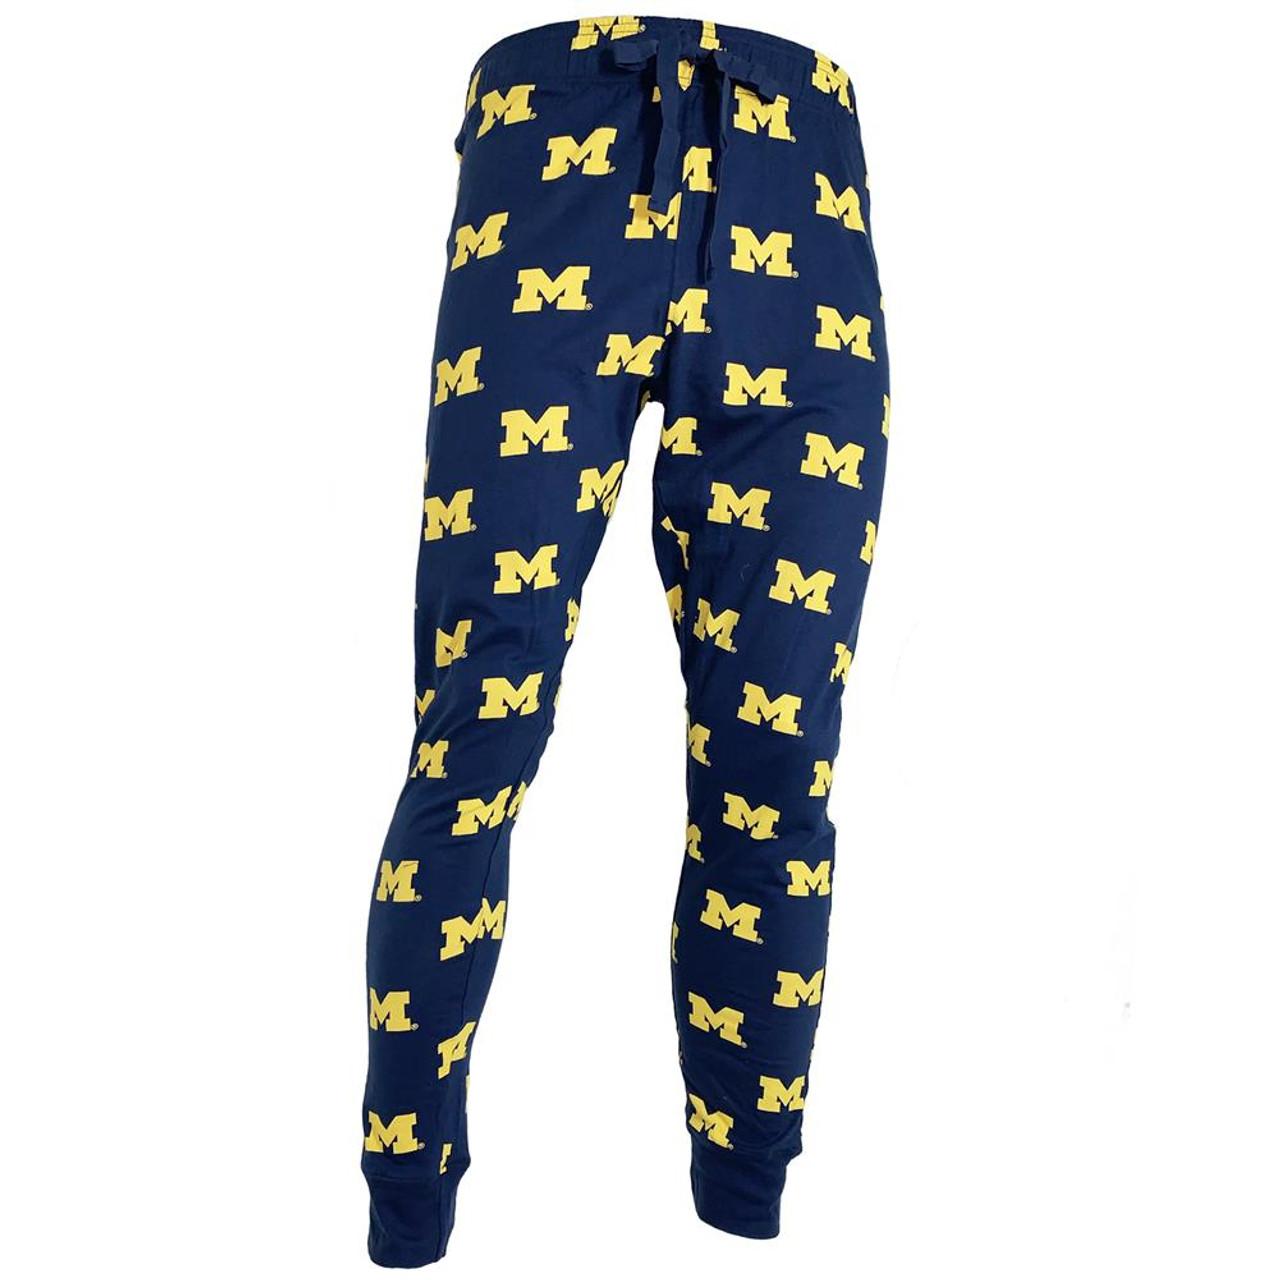 Mens FSU Florida State University Matching PJs Family Matching Pajamas